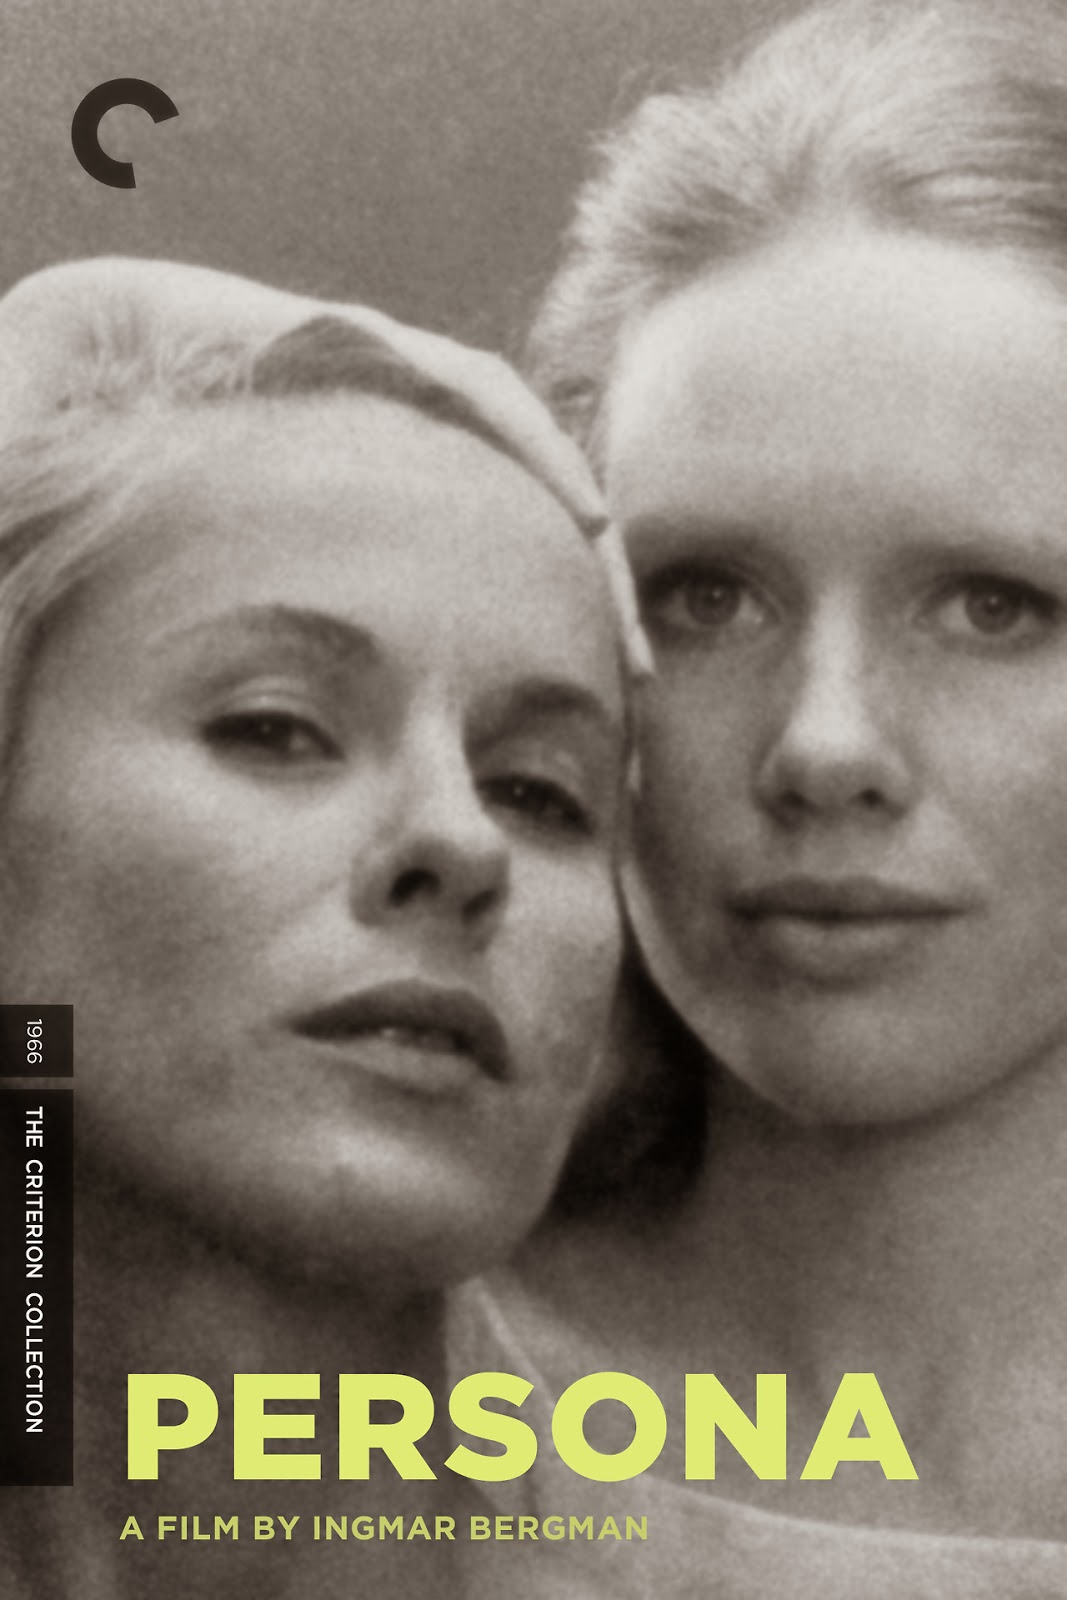 persona 1966 full movie